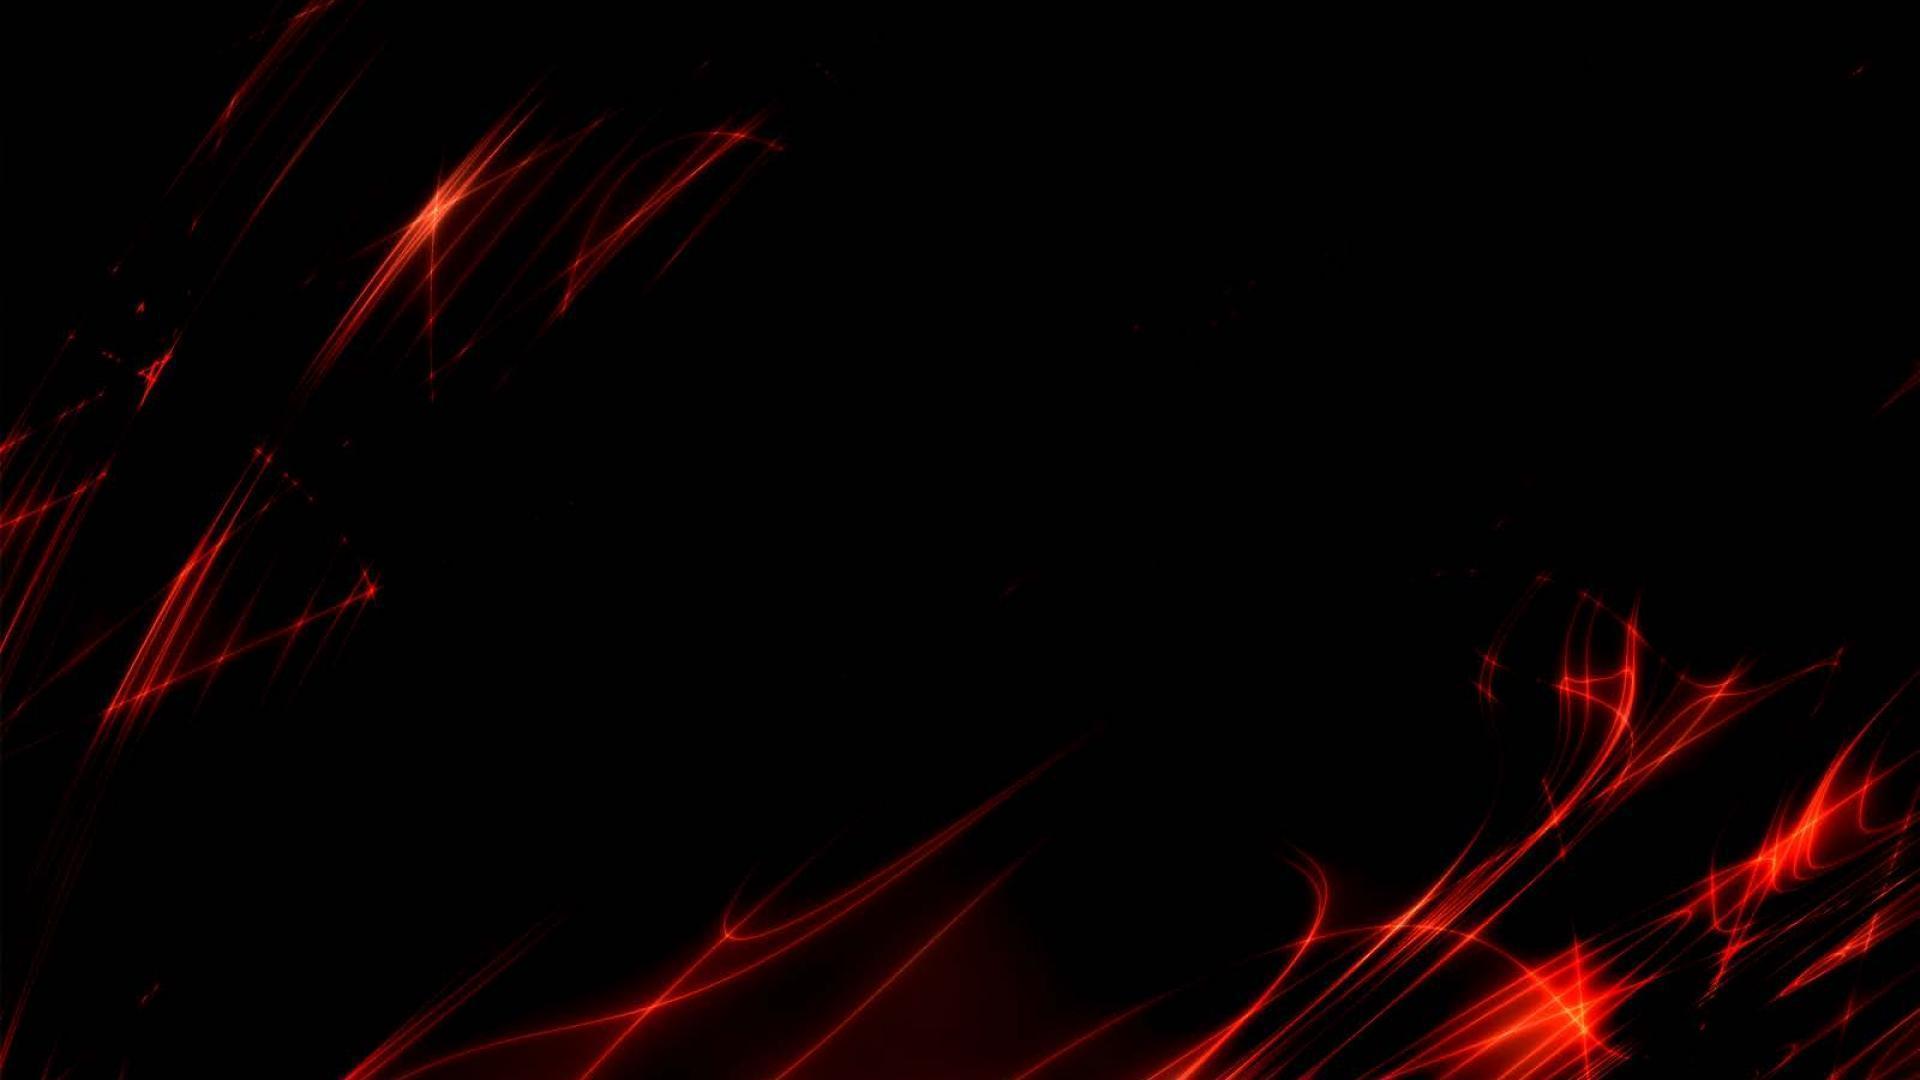 Dark Red Wallpapers - Wallpaper Cave